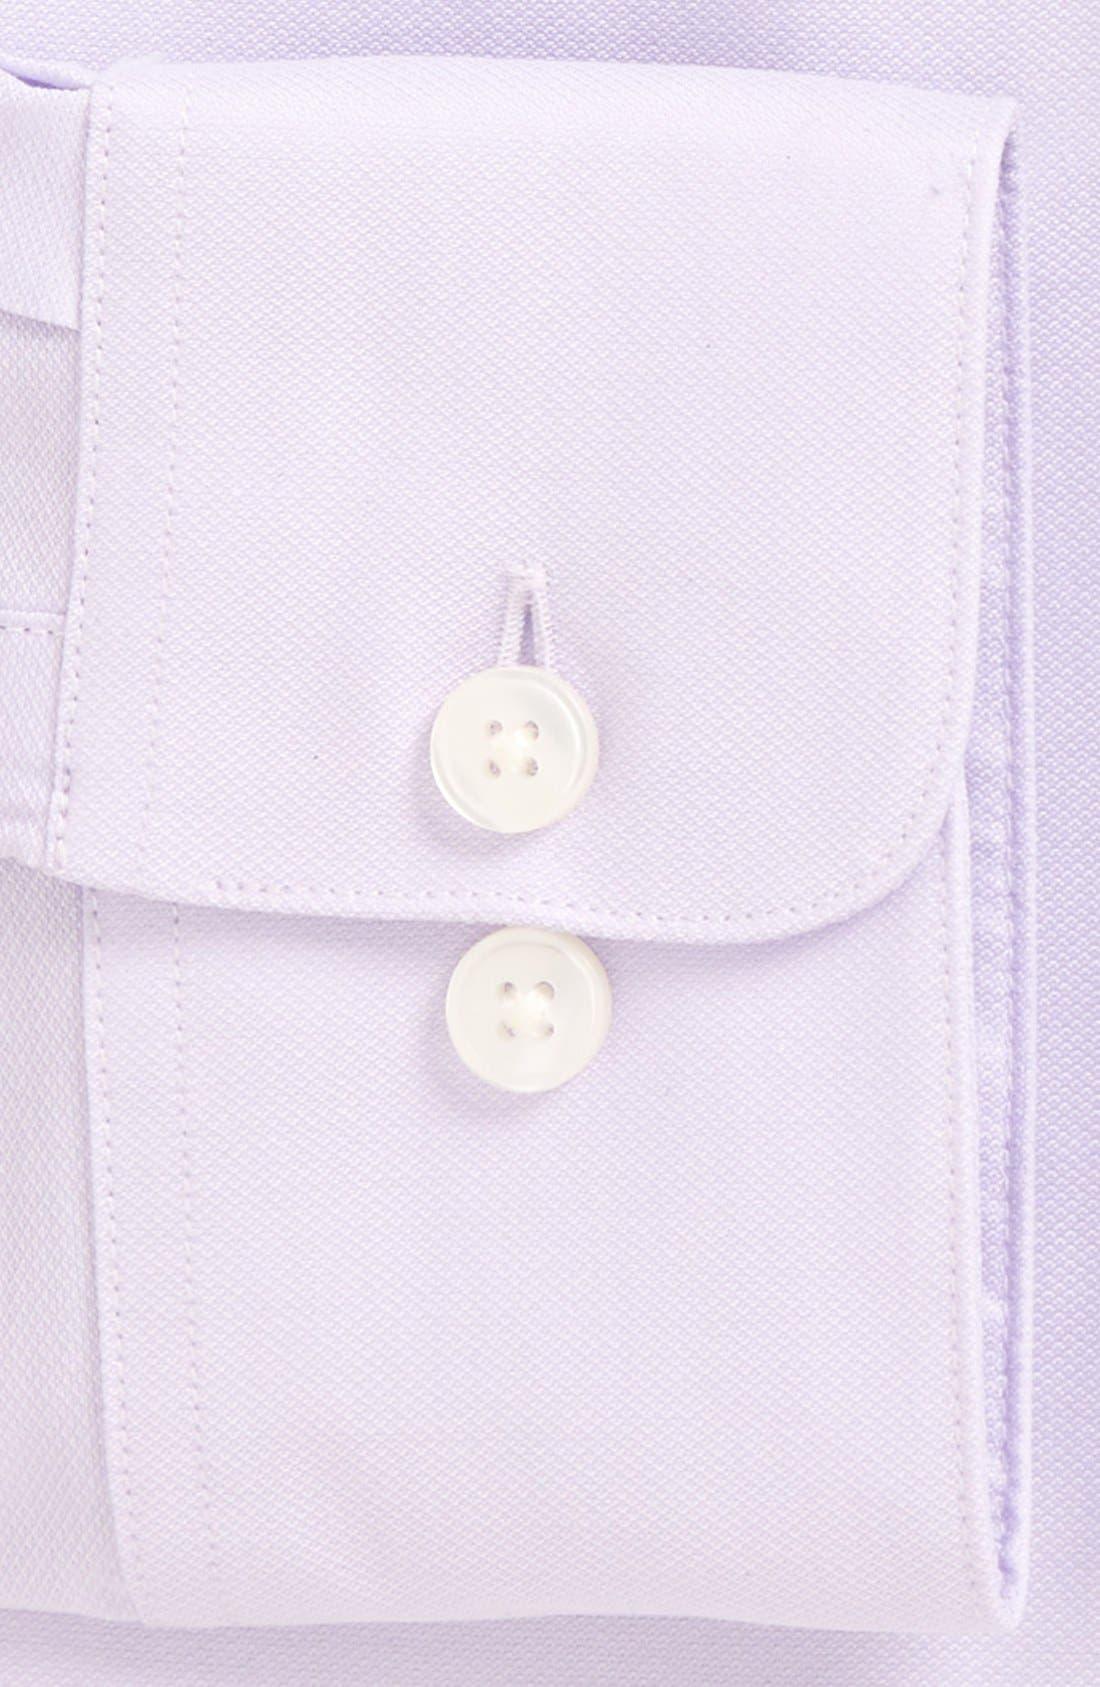 Soho Slim Fit Stretch Solid Dress Shirt,                             Alternate thumbnail 2, color,                             Lavender